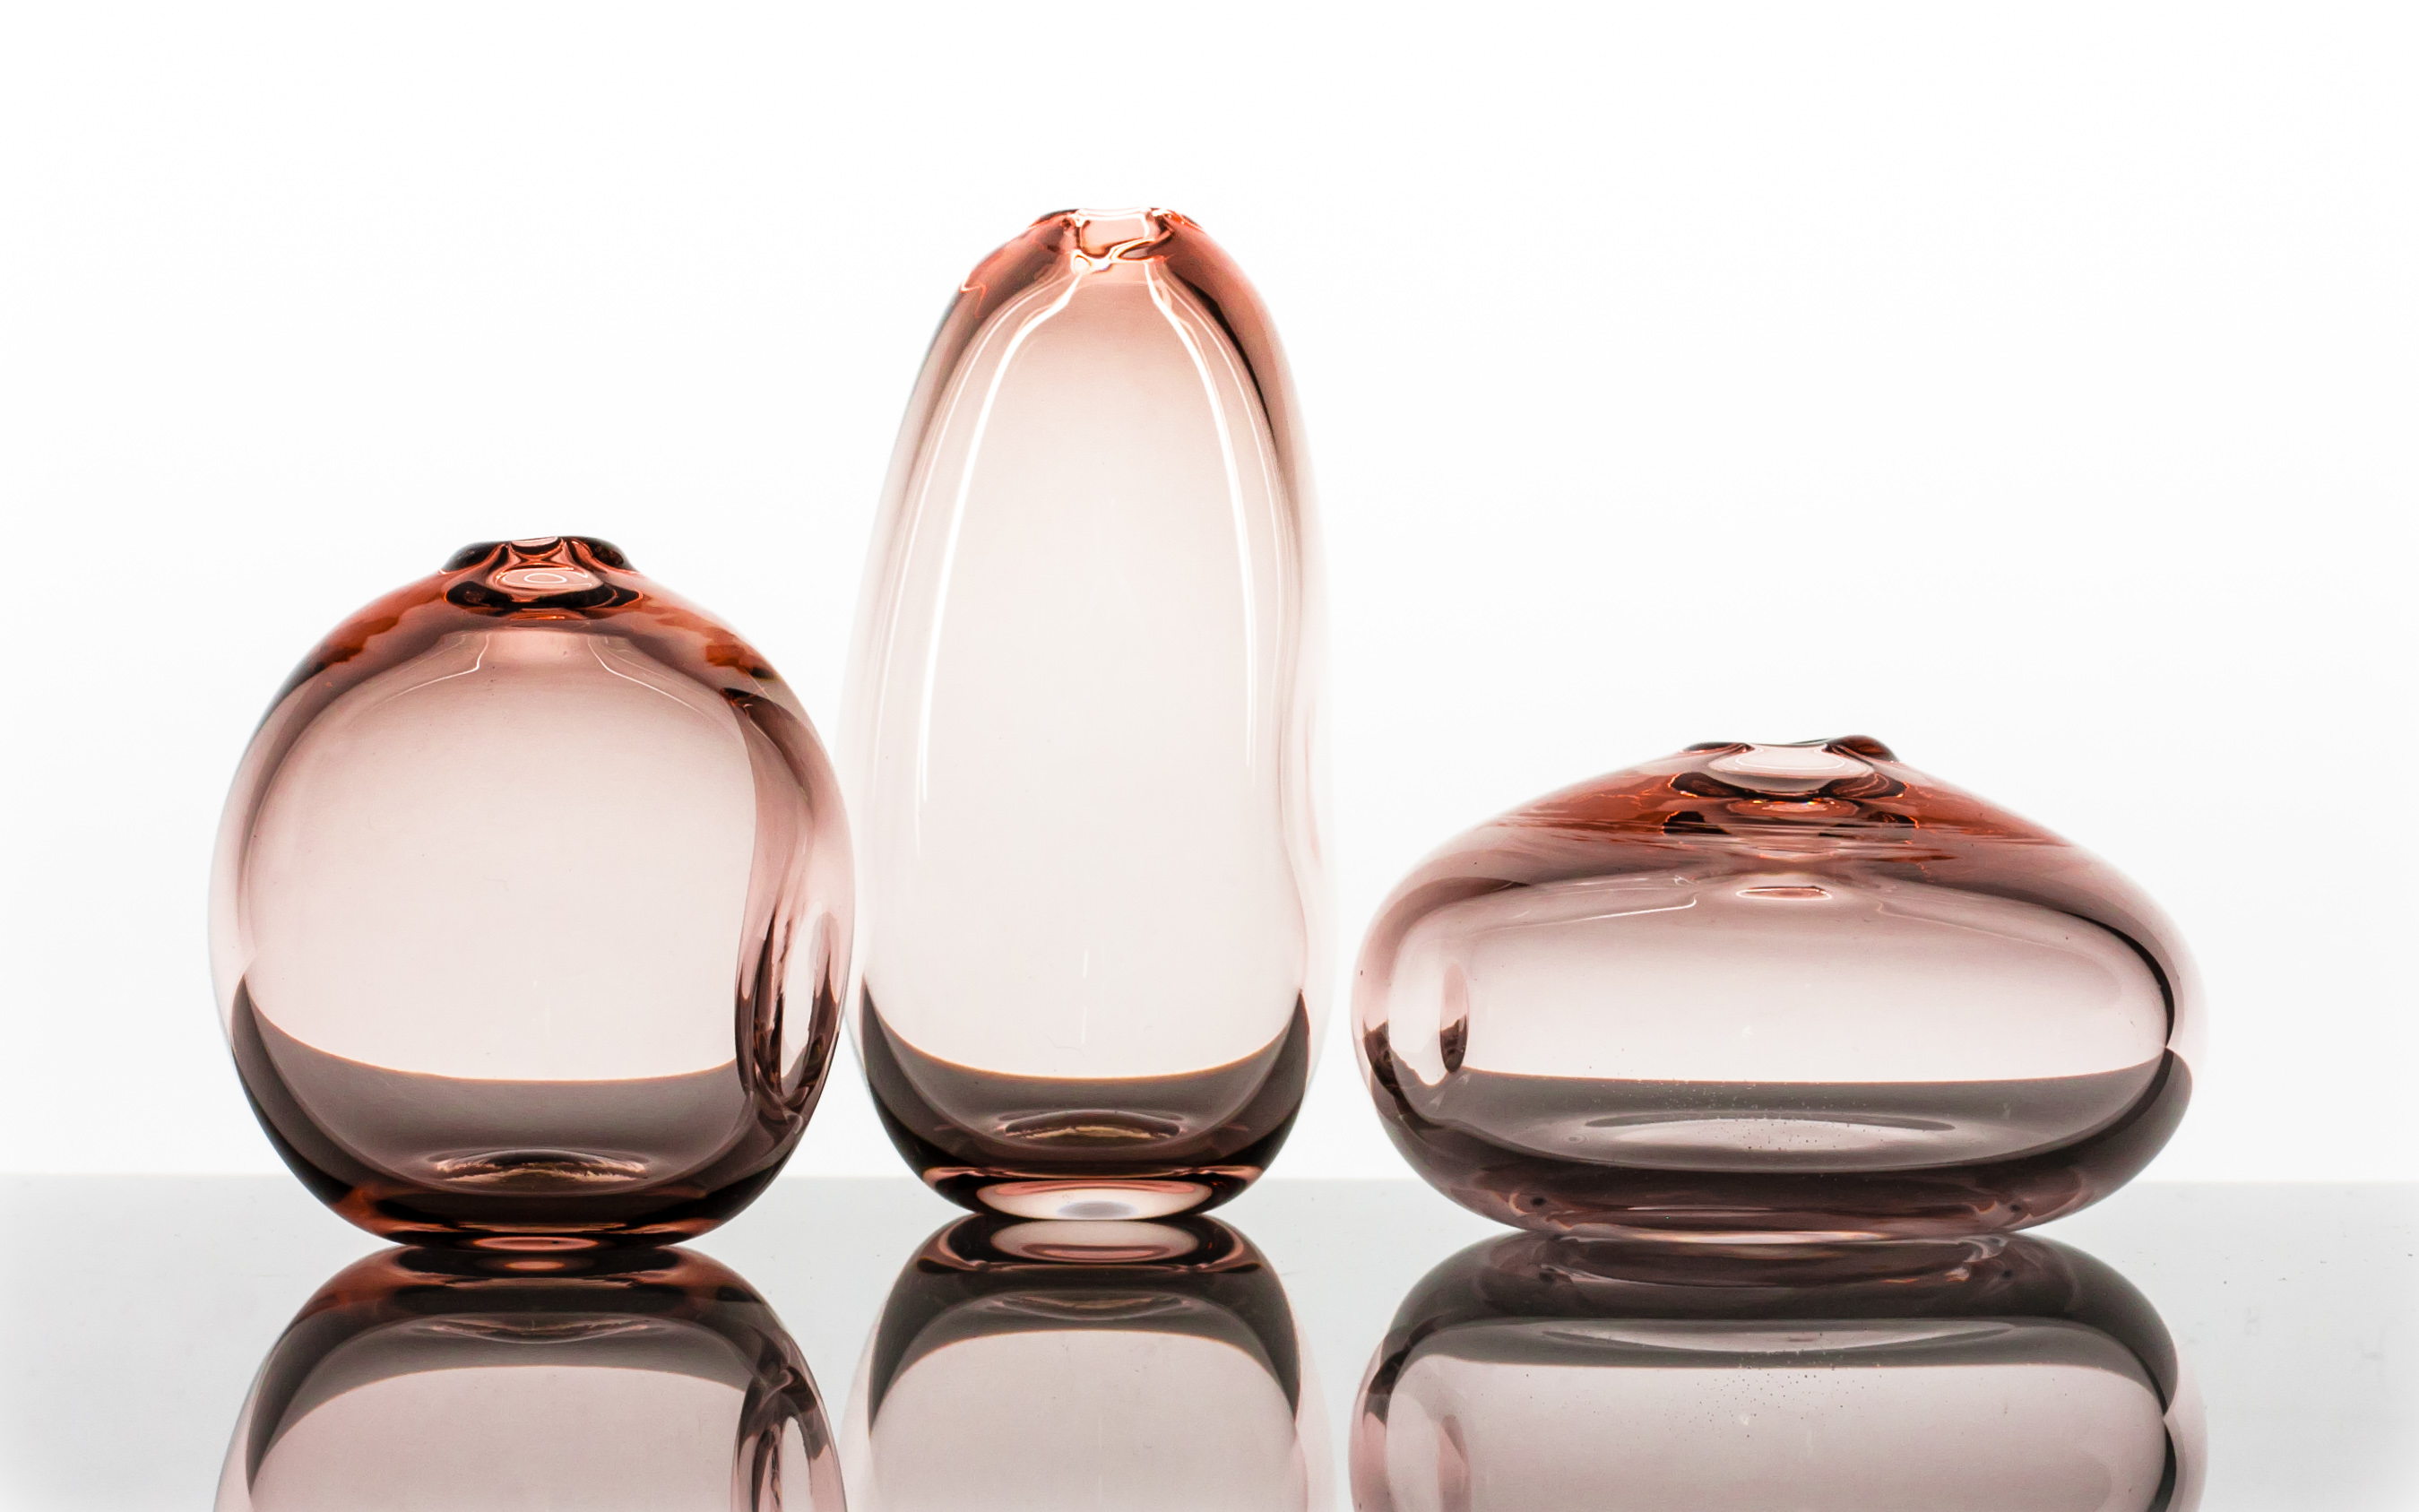 Dimple Vase, Handblown Glass, Tea